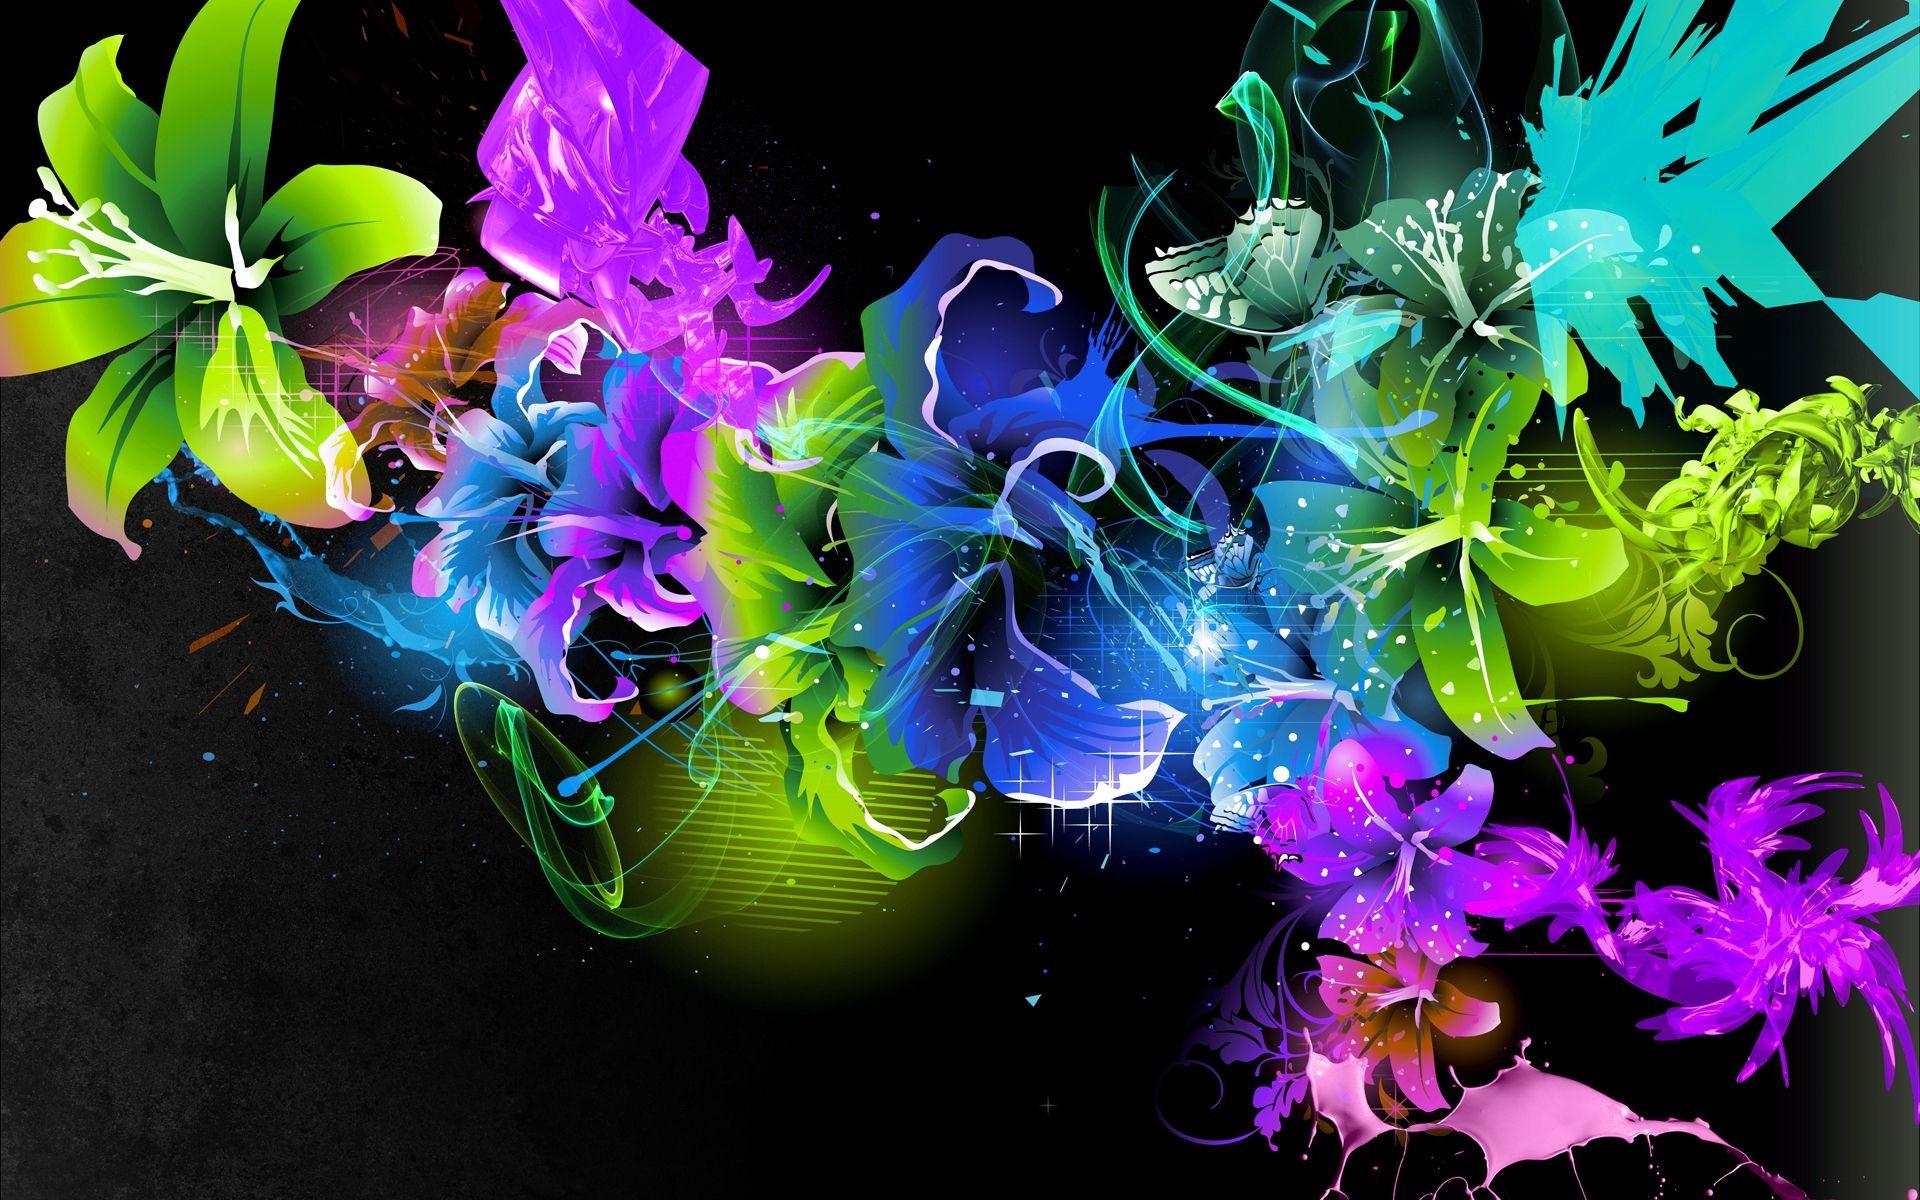 Color Abstract Wallpaper | HD Wallpaper